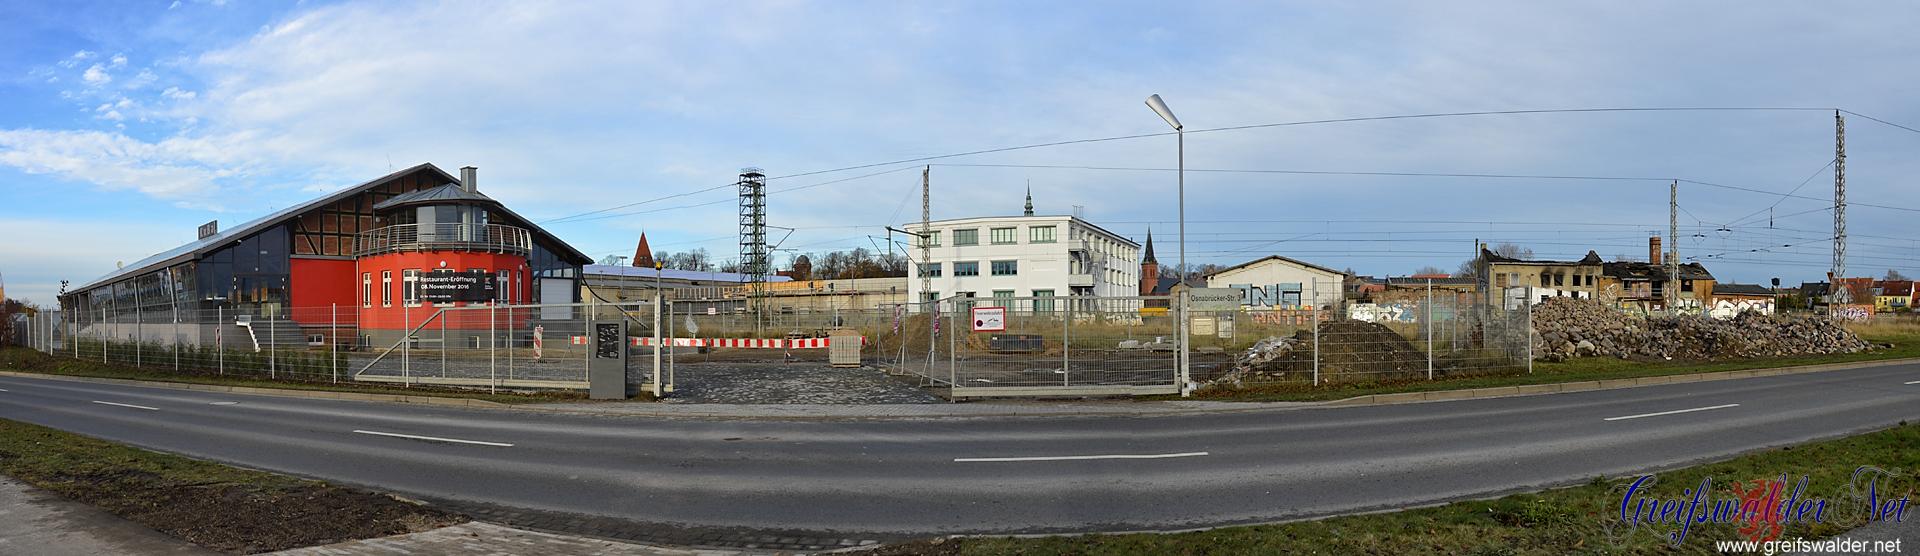 Am ehemaligen Güterbahnhof Greifswald